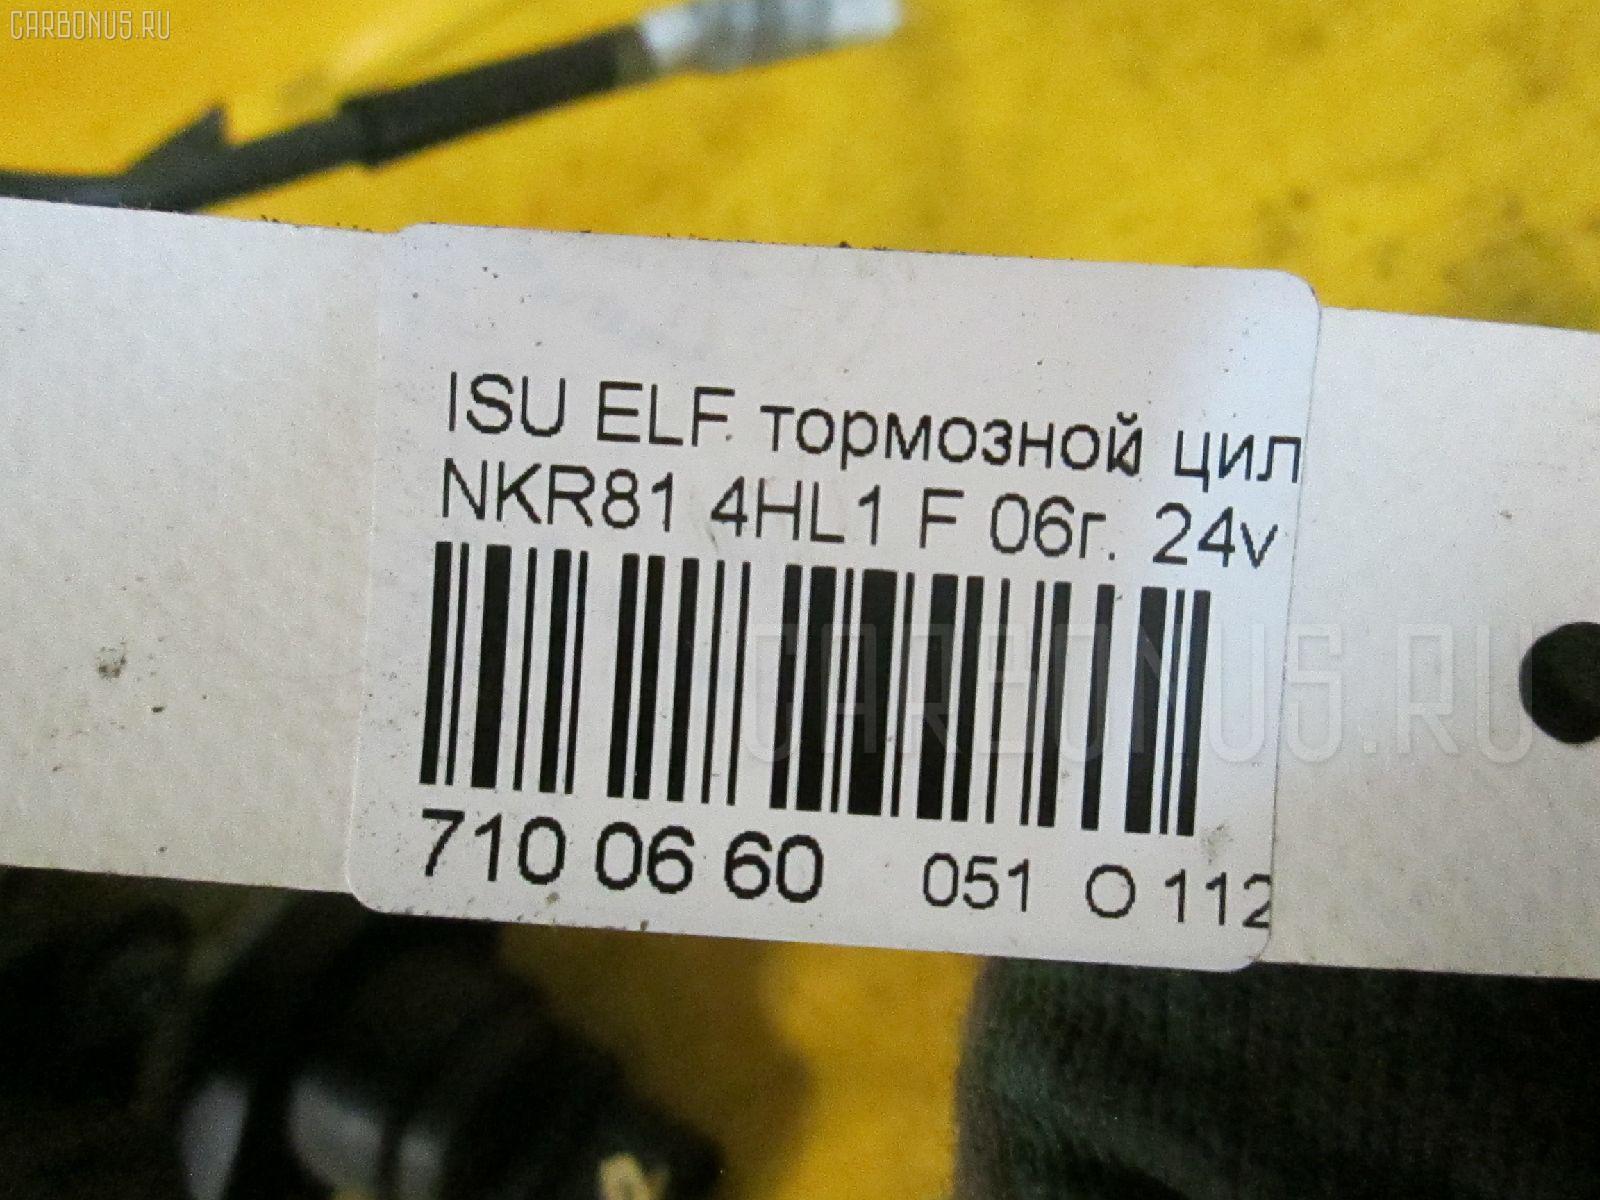 Тормозной цилиндр ISUZU ELF NKR81 4HL1 Фото 9